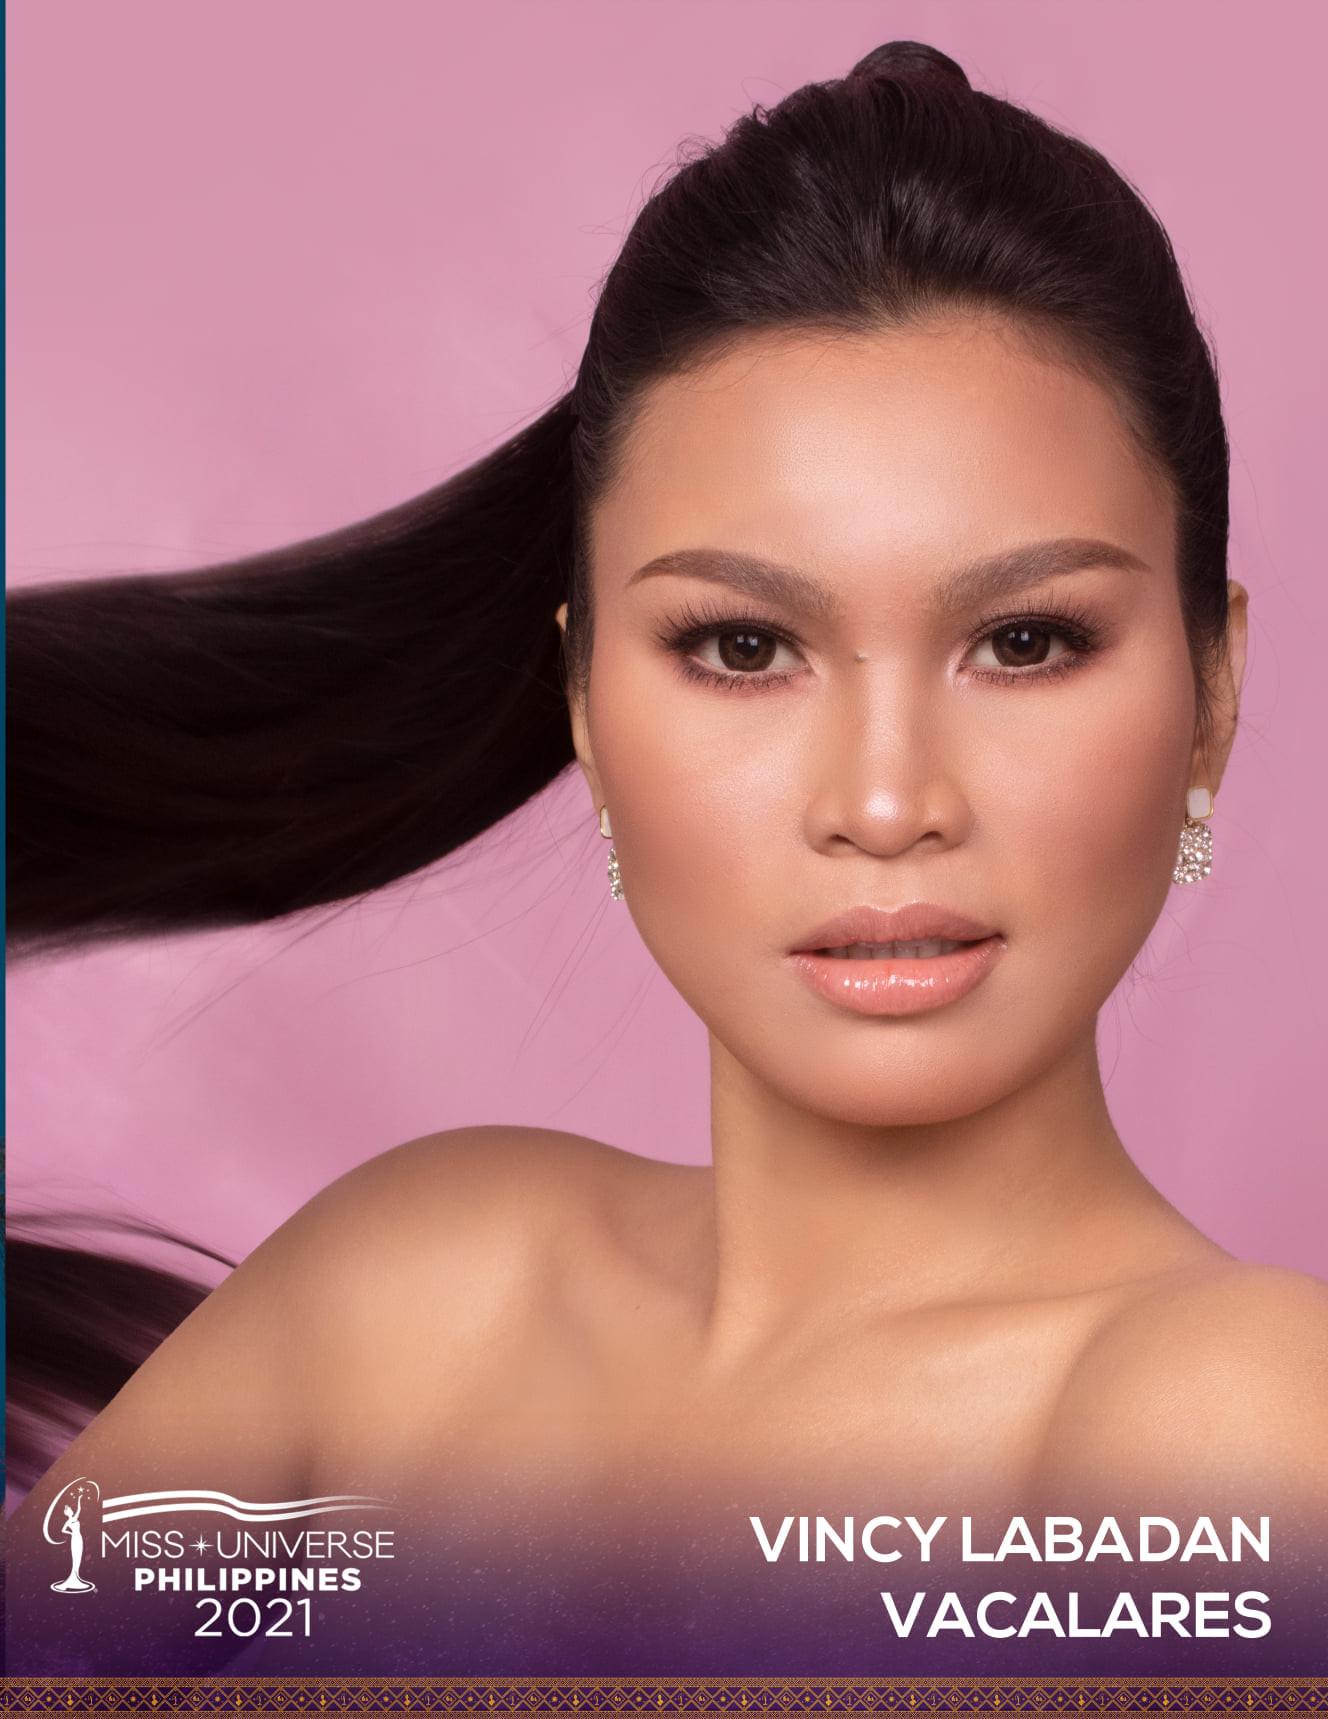 pre-candidatas a miss universe philippines 2021. - Página 7 AlMvEv